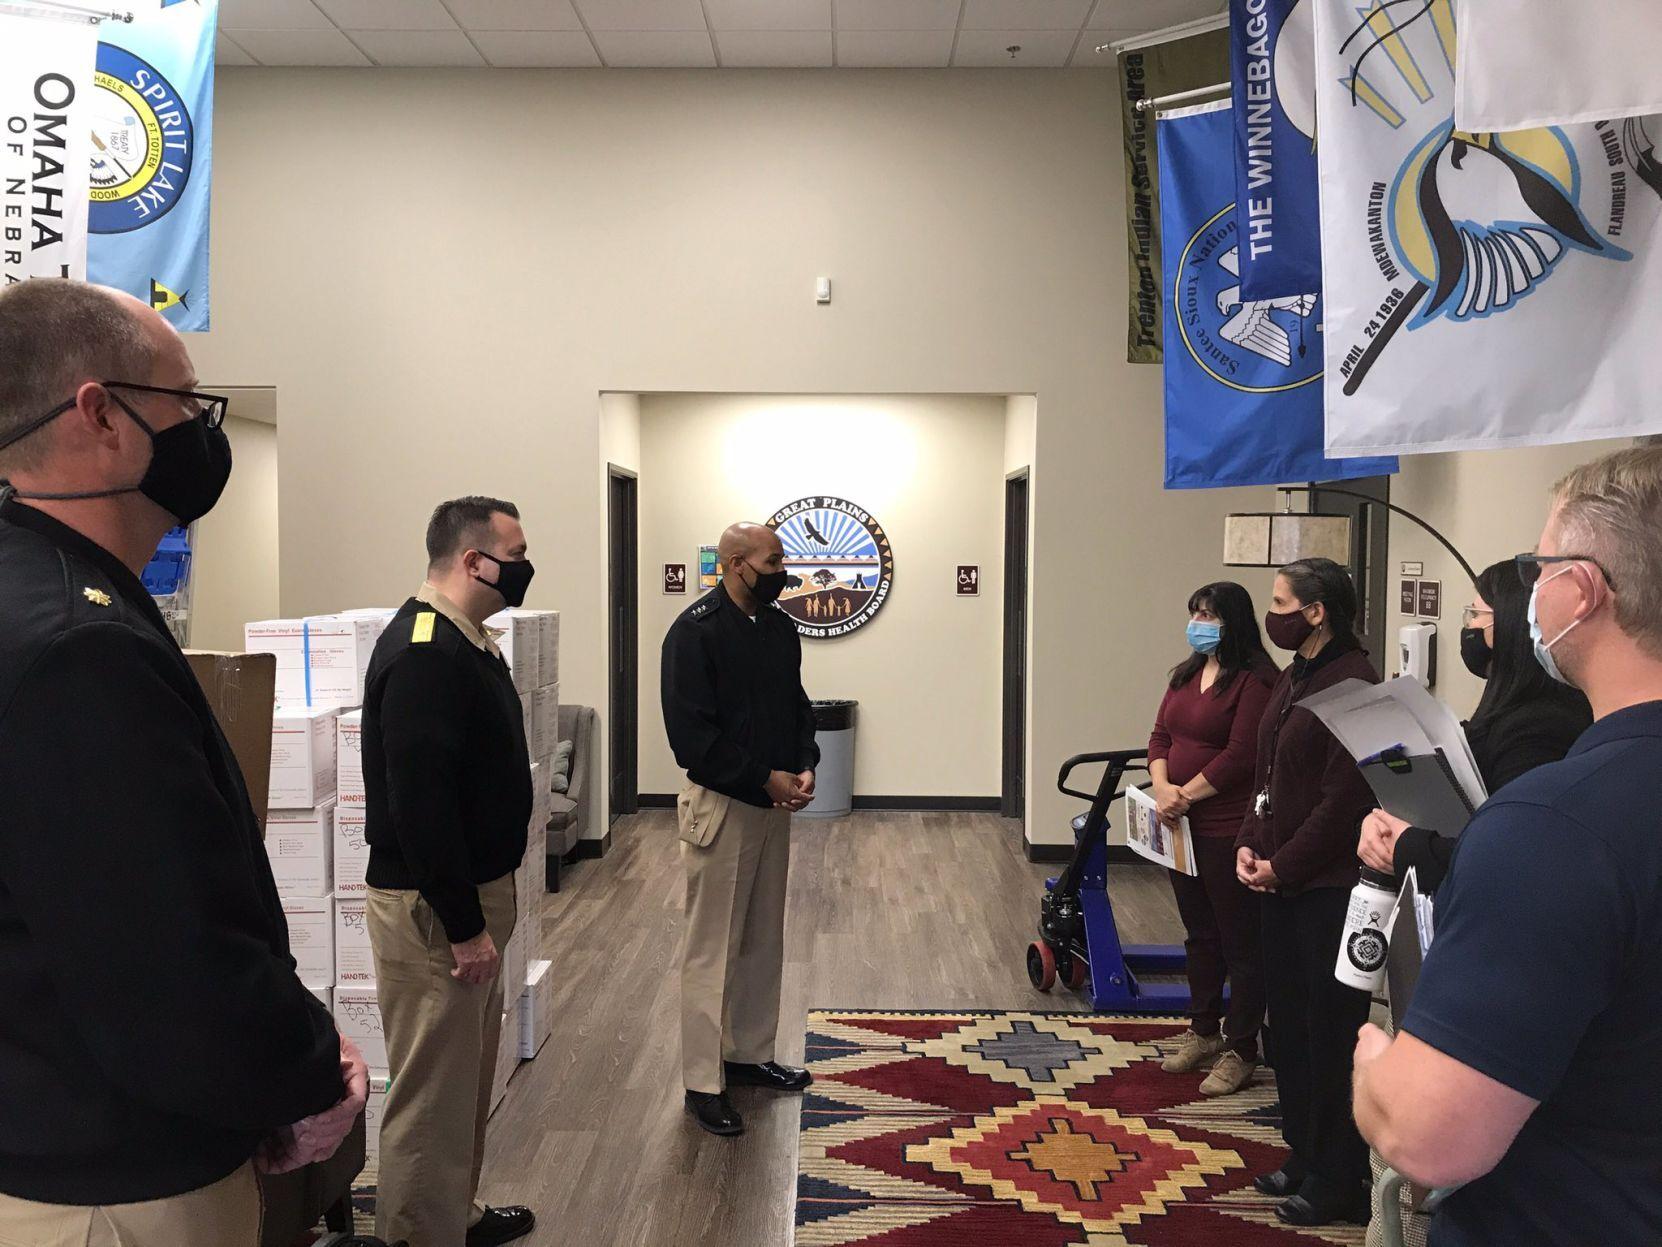 U S Surgeon General Visits South Dakota To Set Up Covid 19 Surge Testing Site Local Rapidcityjournal Com